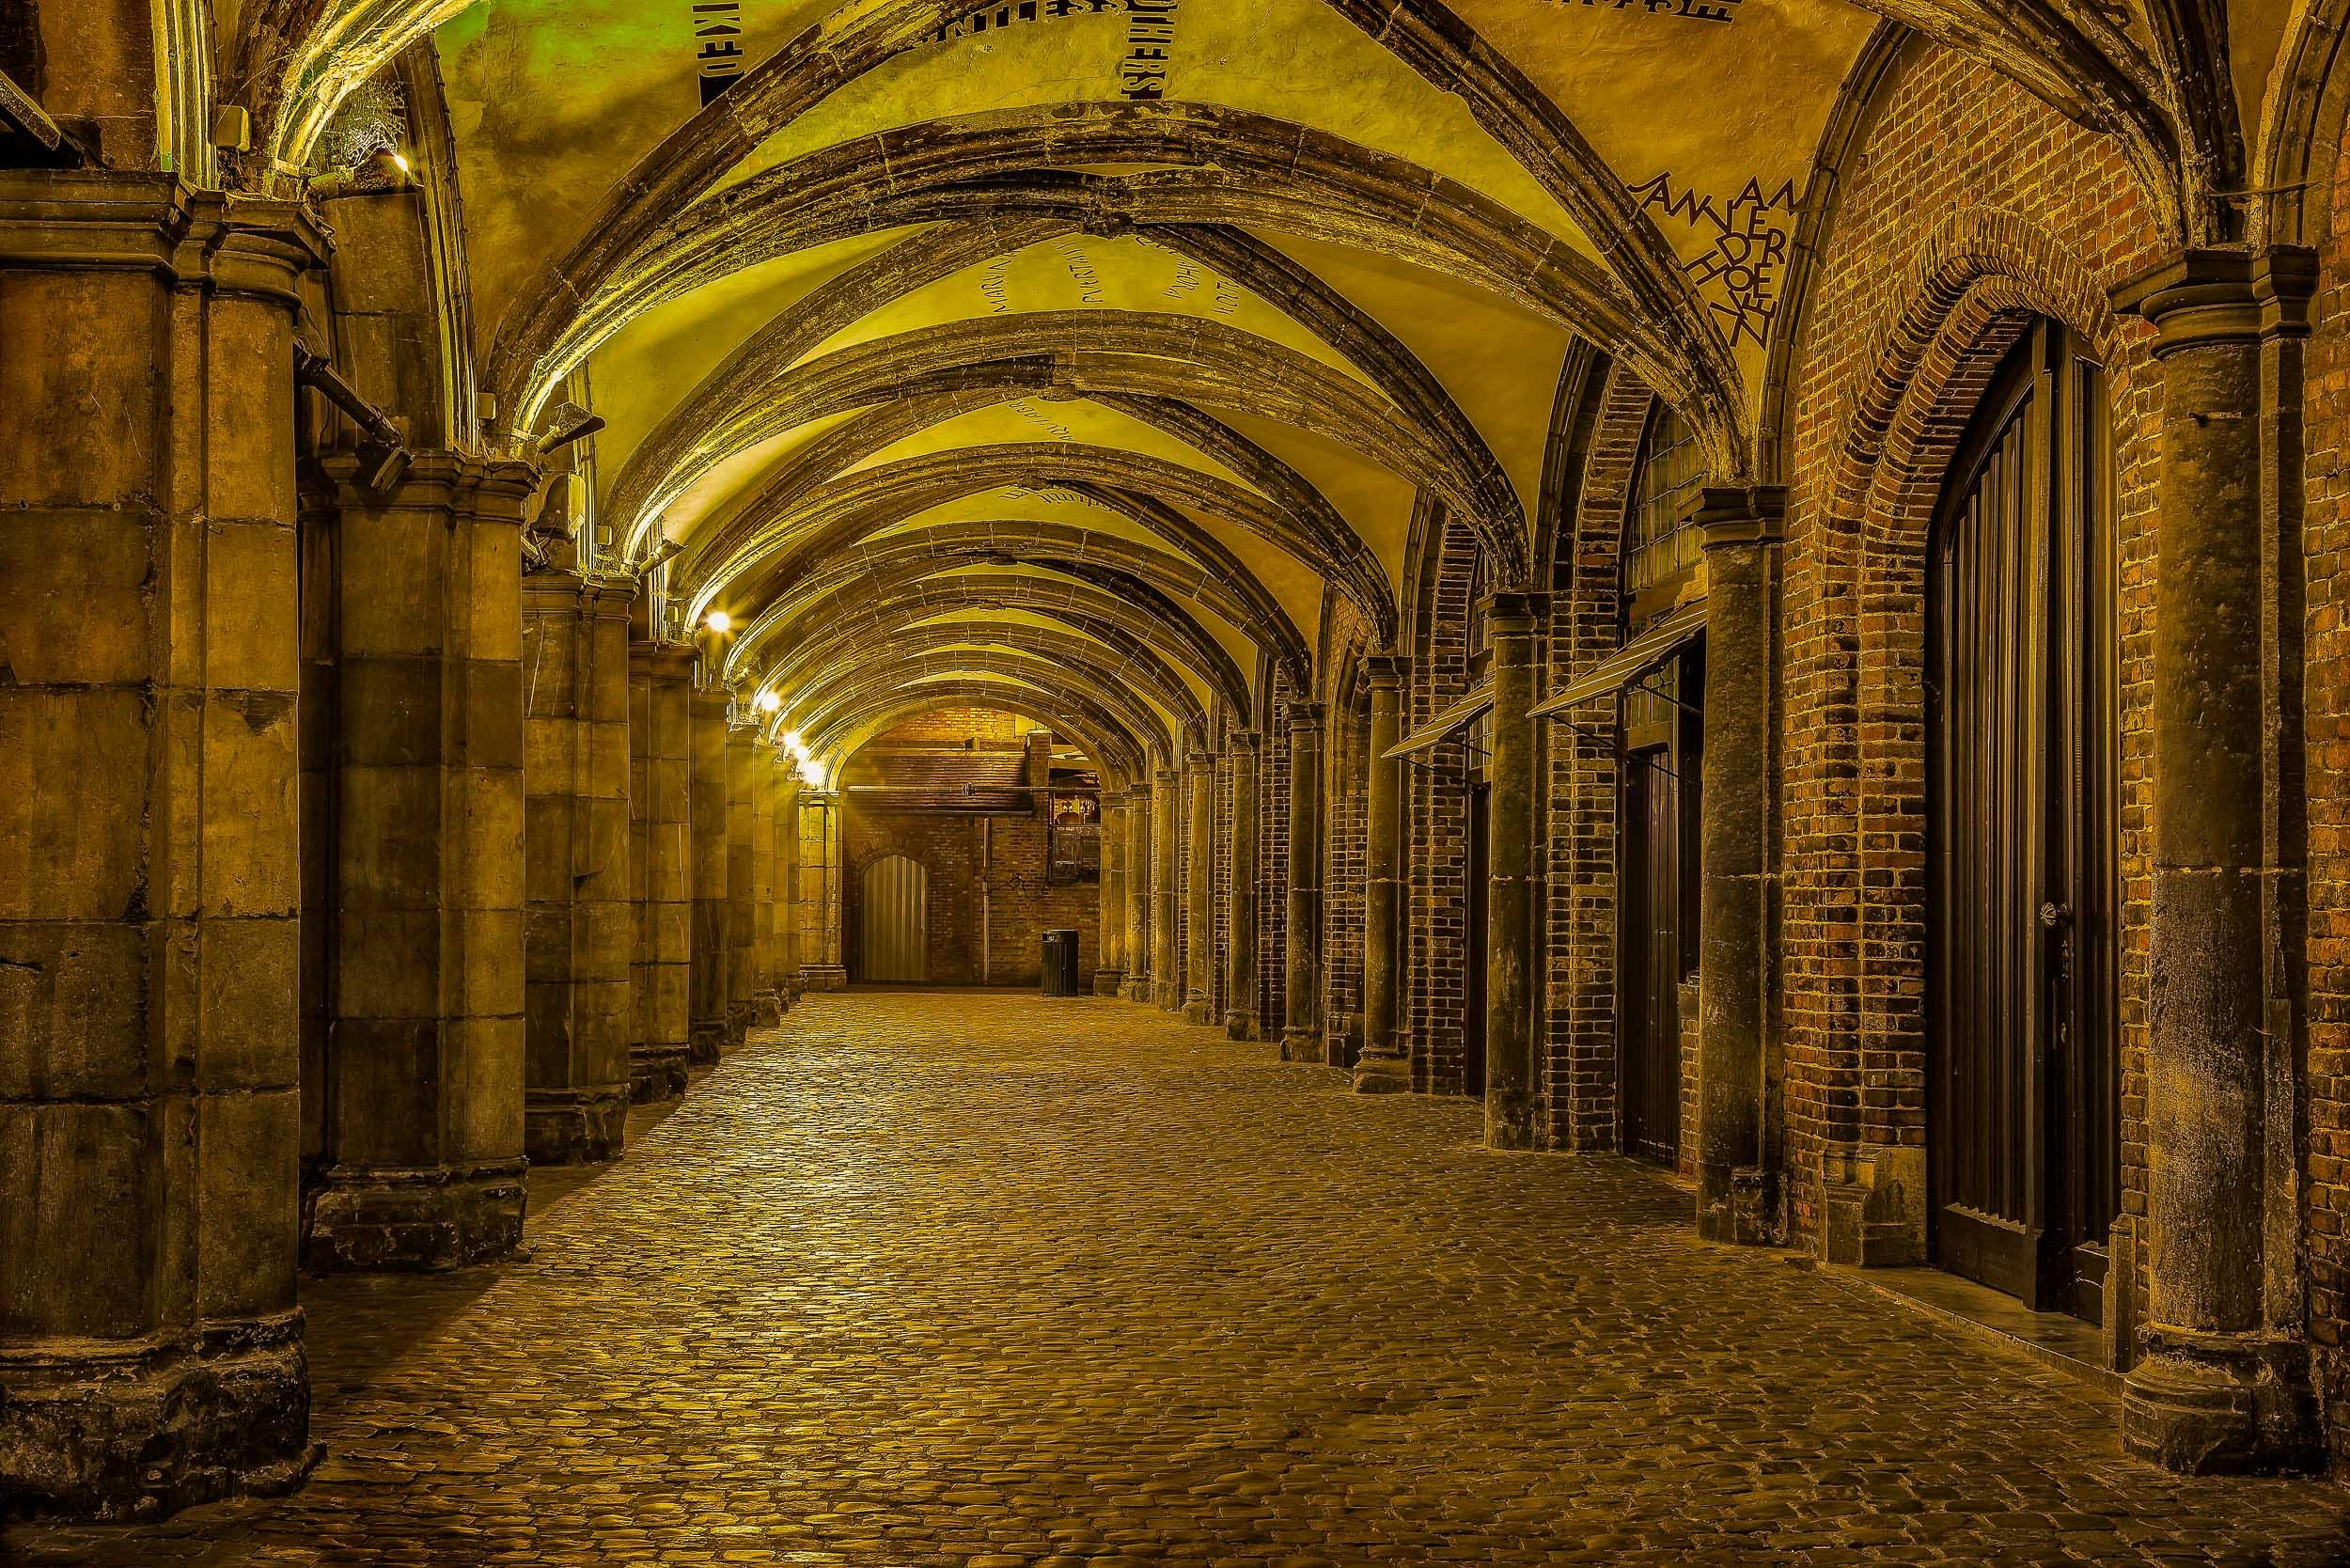 Artificial light illuminates this brooding walkway at night in    Bruges, Belgium   .